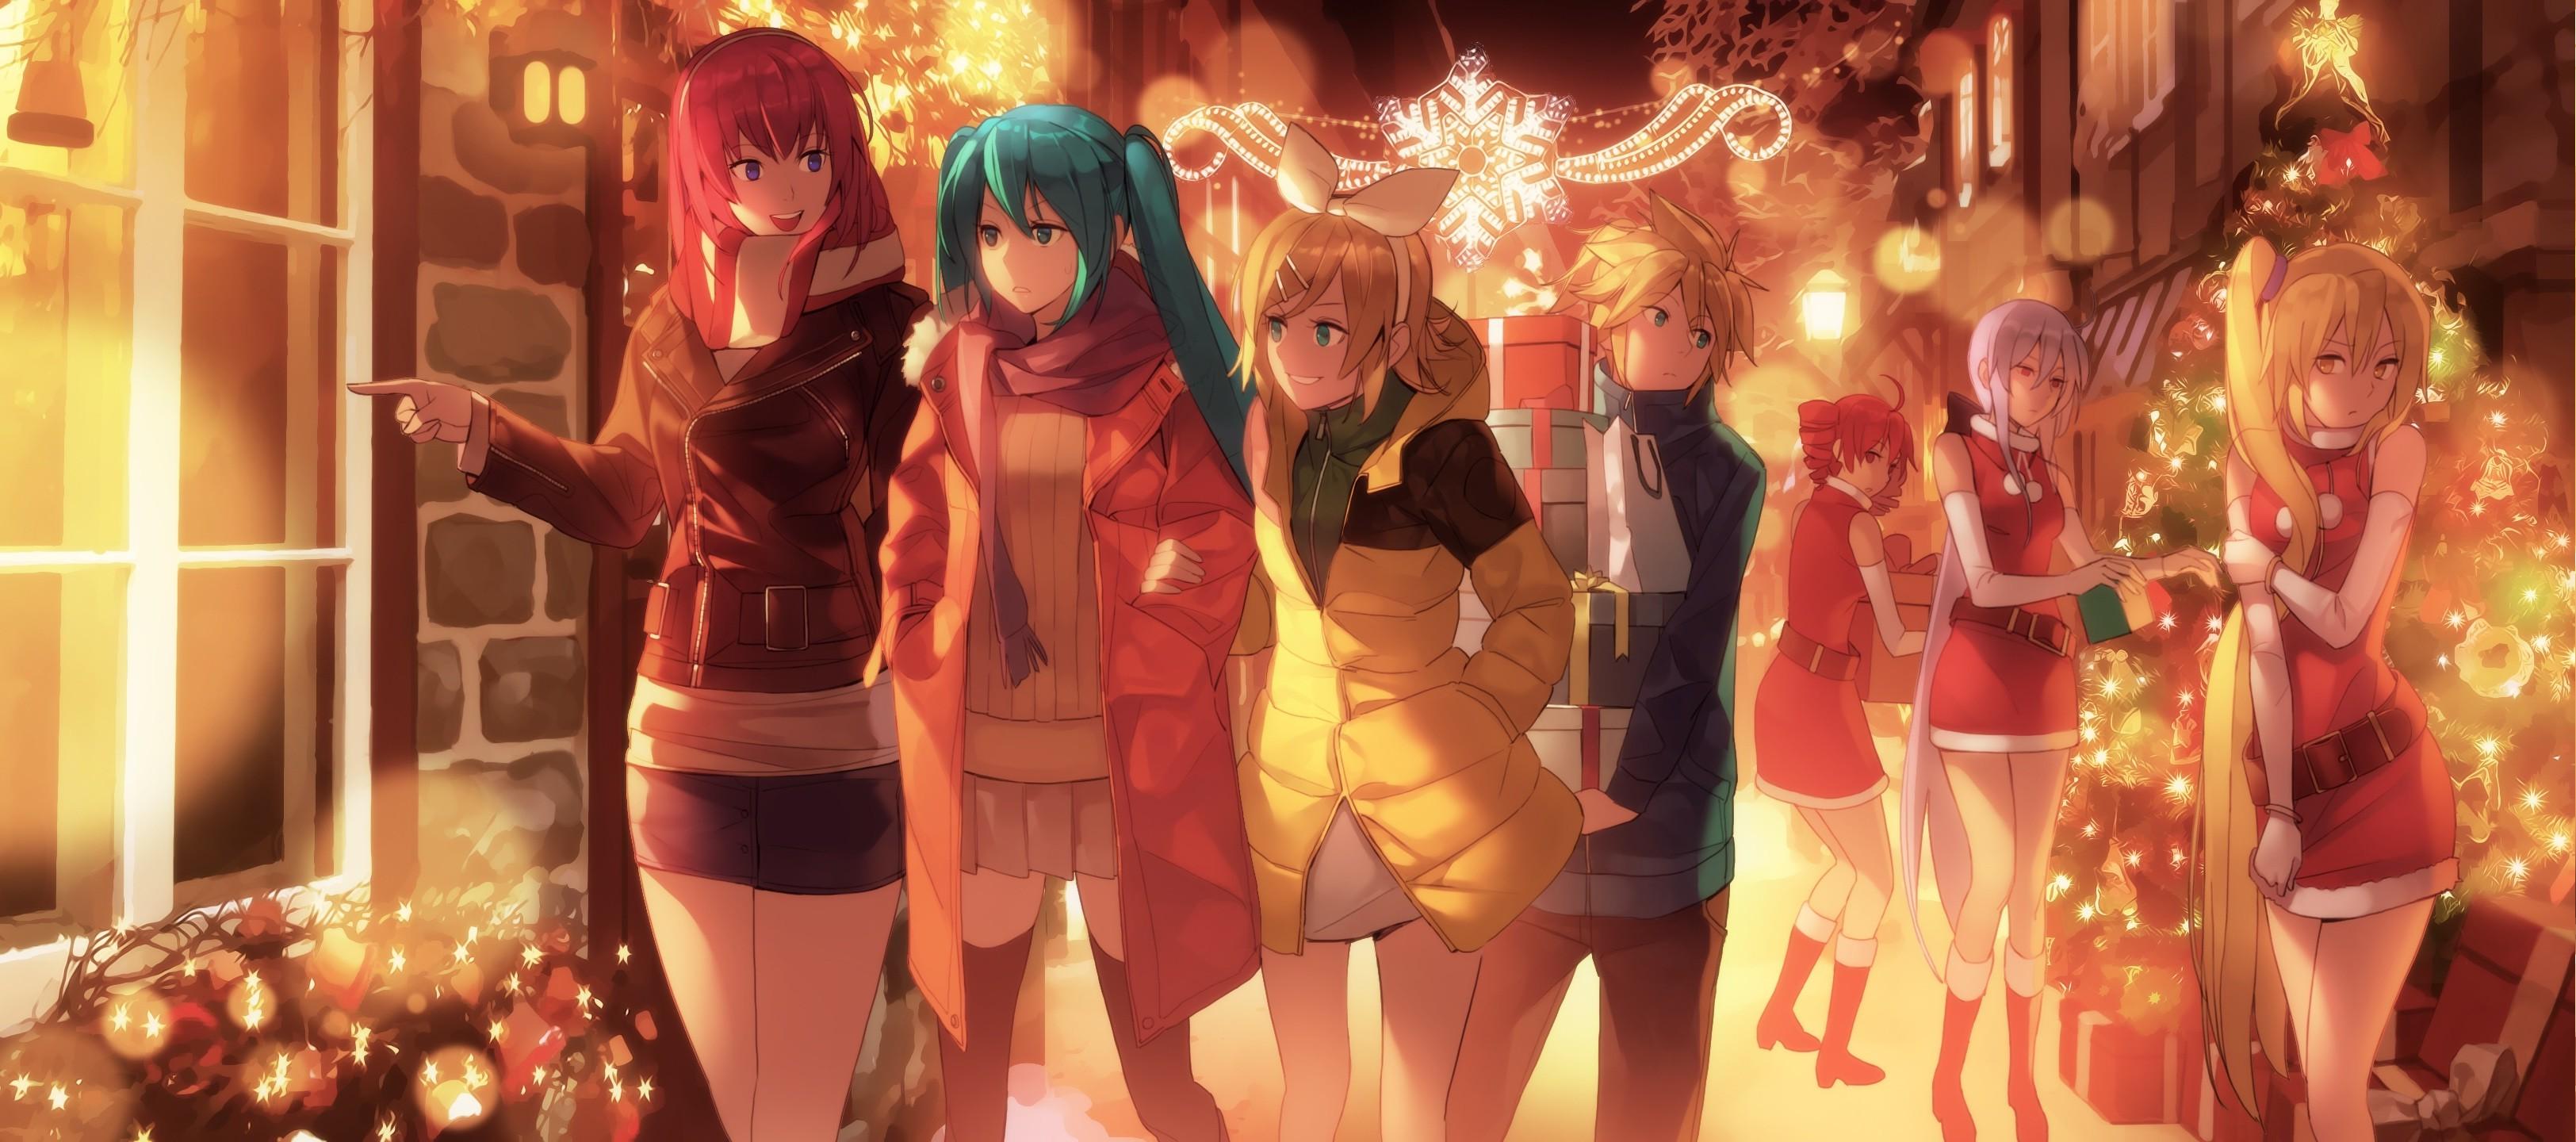 Wallpaper : anime, Vocaloid, Hatsune Miku, Christmas Tree, Kagamine ...